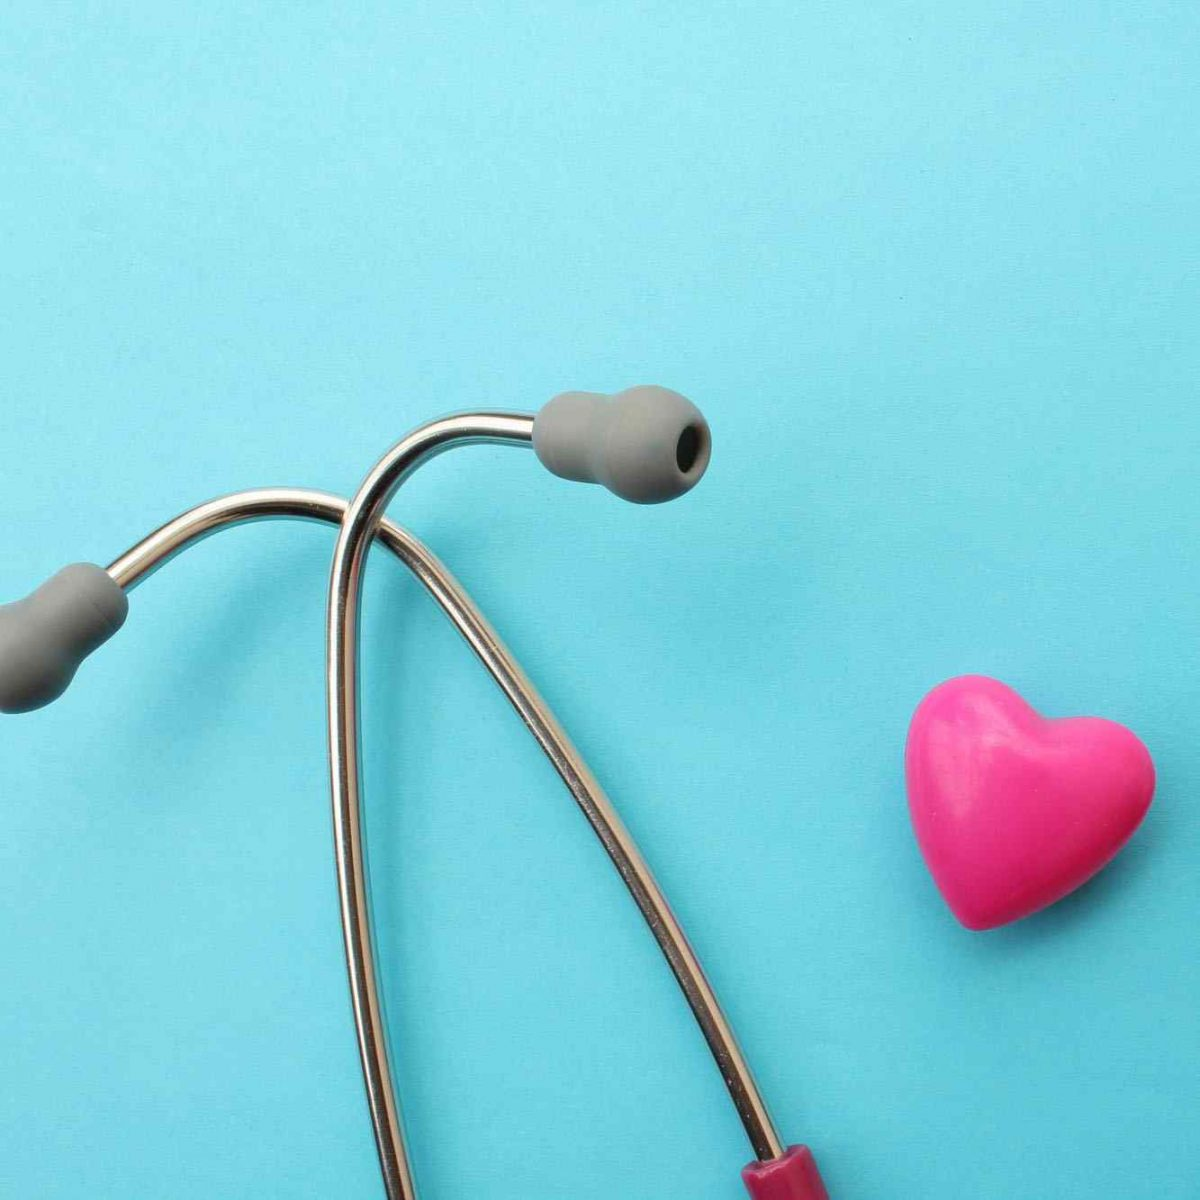 srce-i-stetoskop-1200x1200.jpg